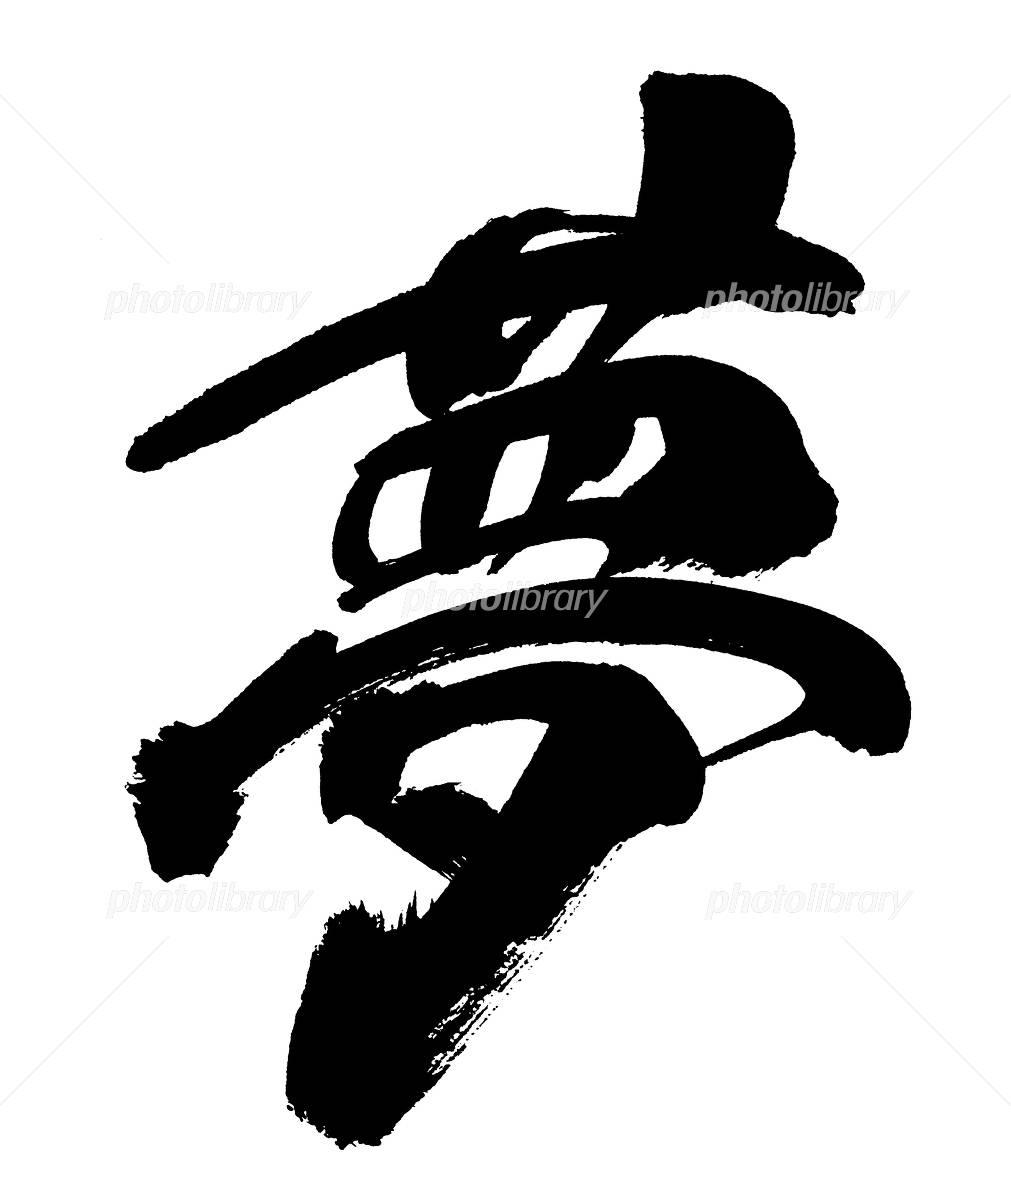 Calligraphy dream イラスト素材